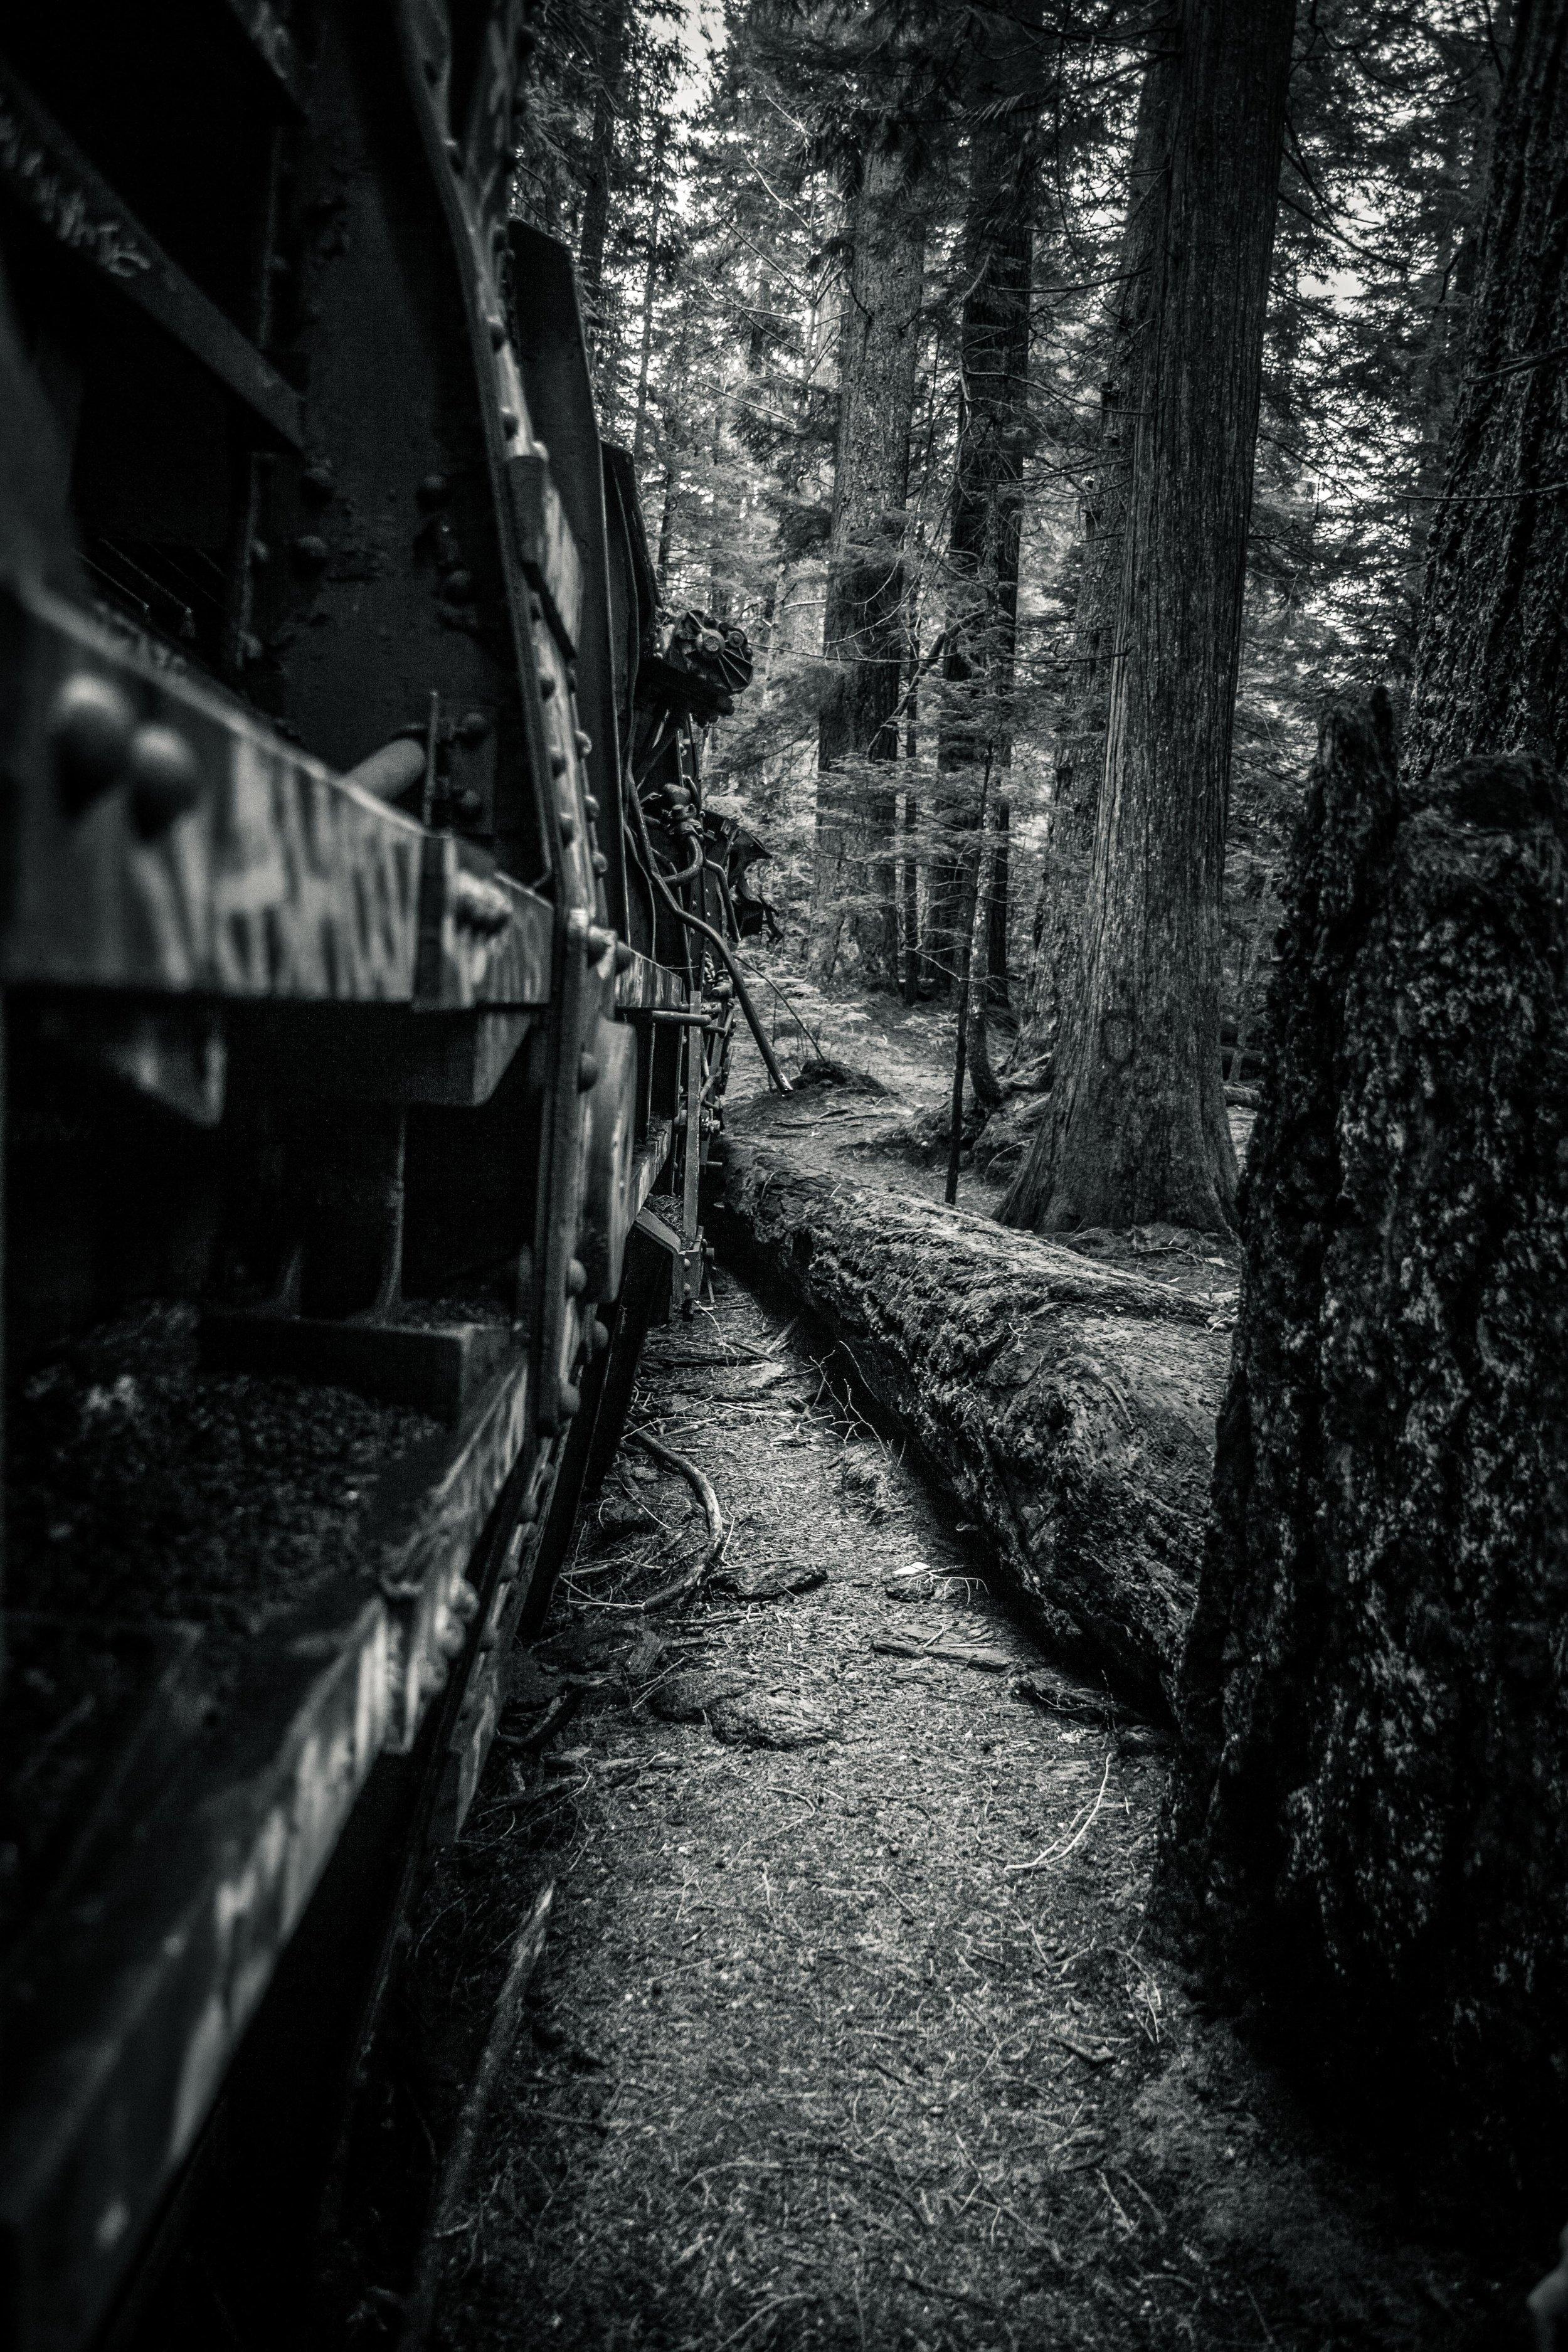 Train Wrecks - Whistler